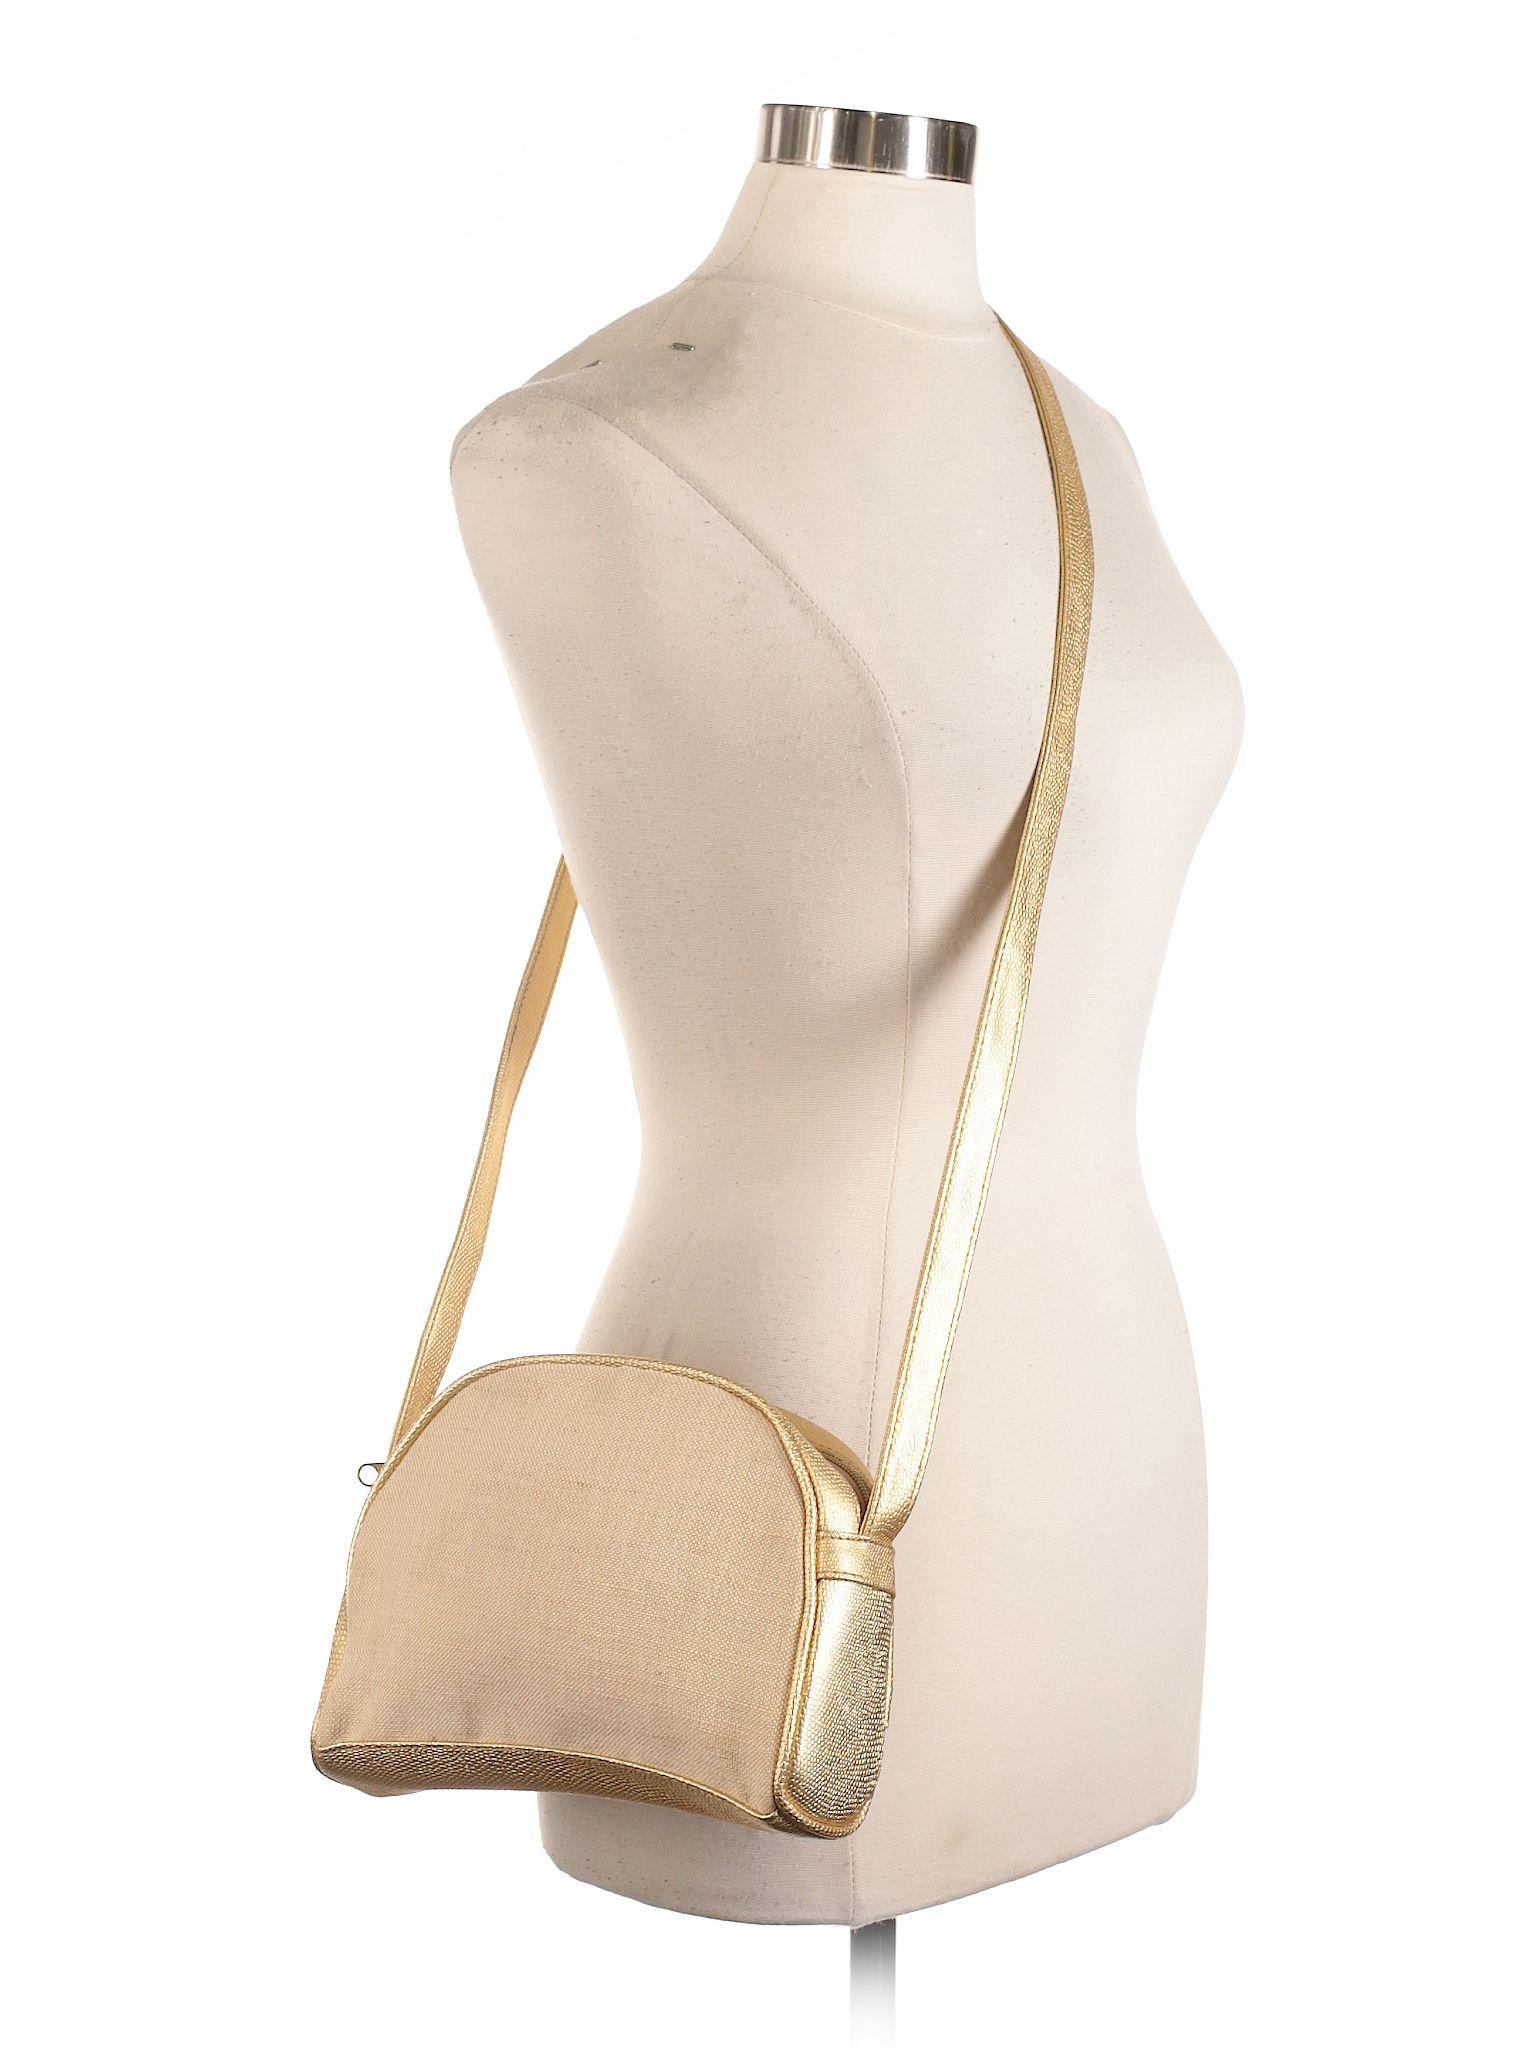 Check It Out Tianni Handbags Crossbody Bag For 27 99 On Thredup